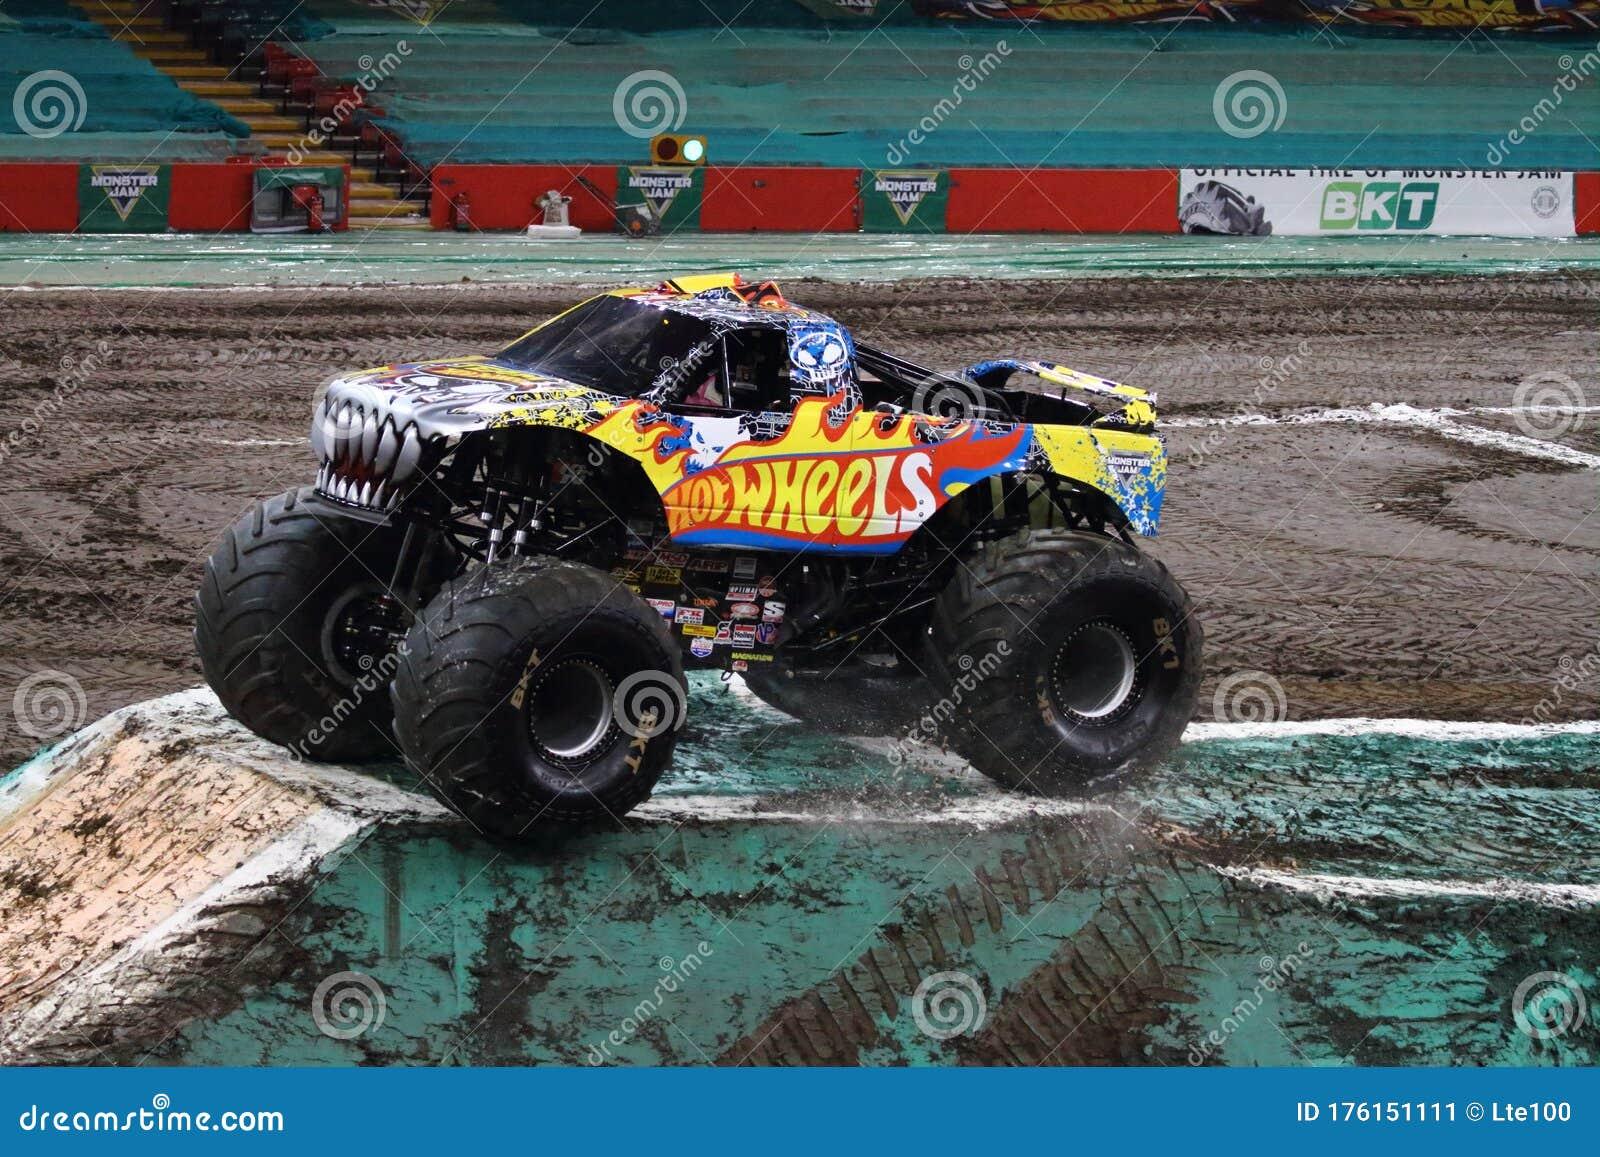 Hotwheels On The Mud Editorial Photo Image Of Hotwheels 176151111